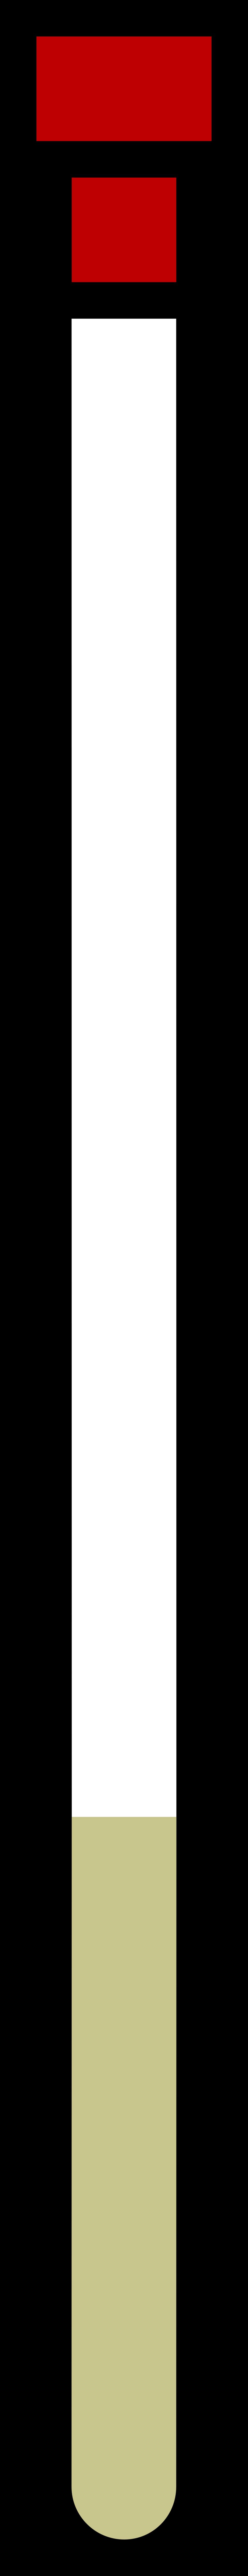 NMR tube